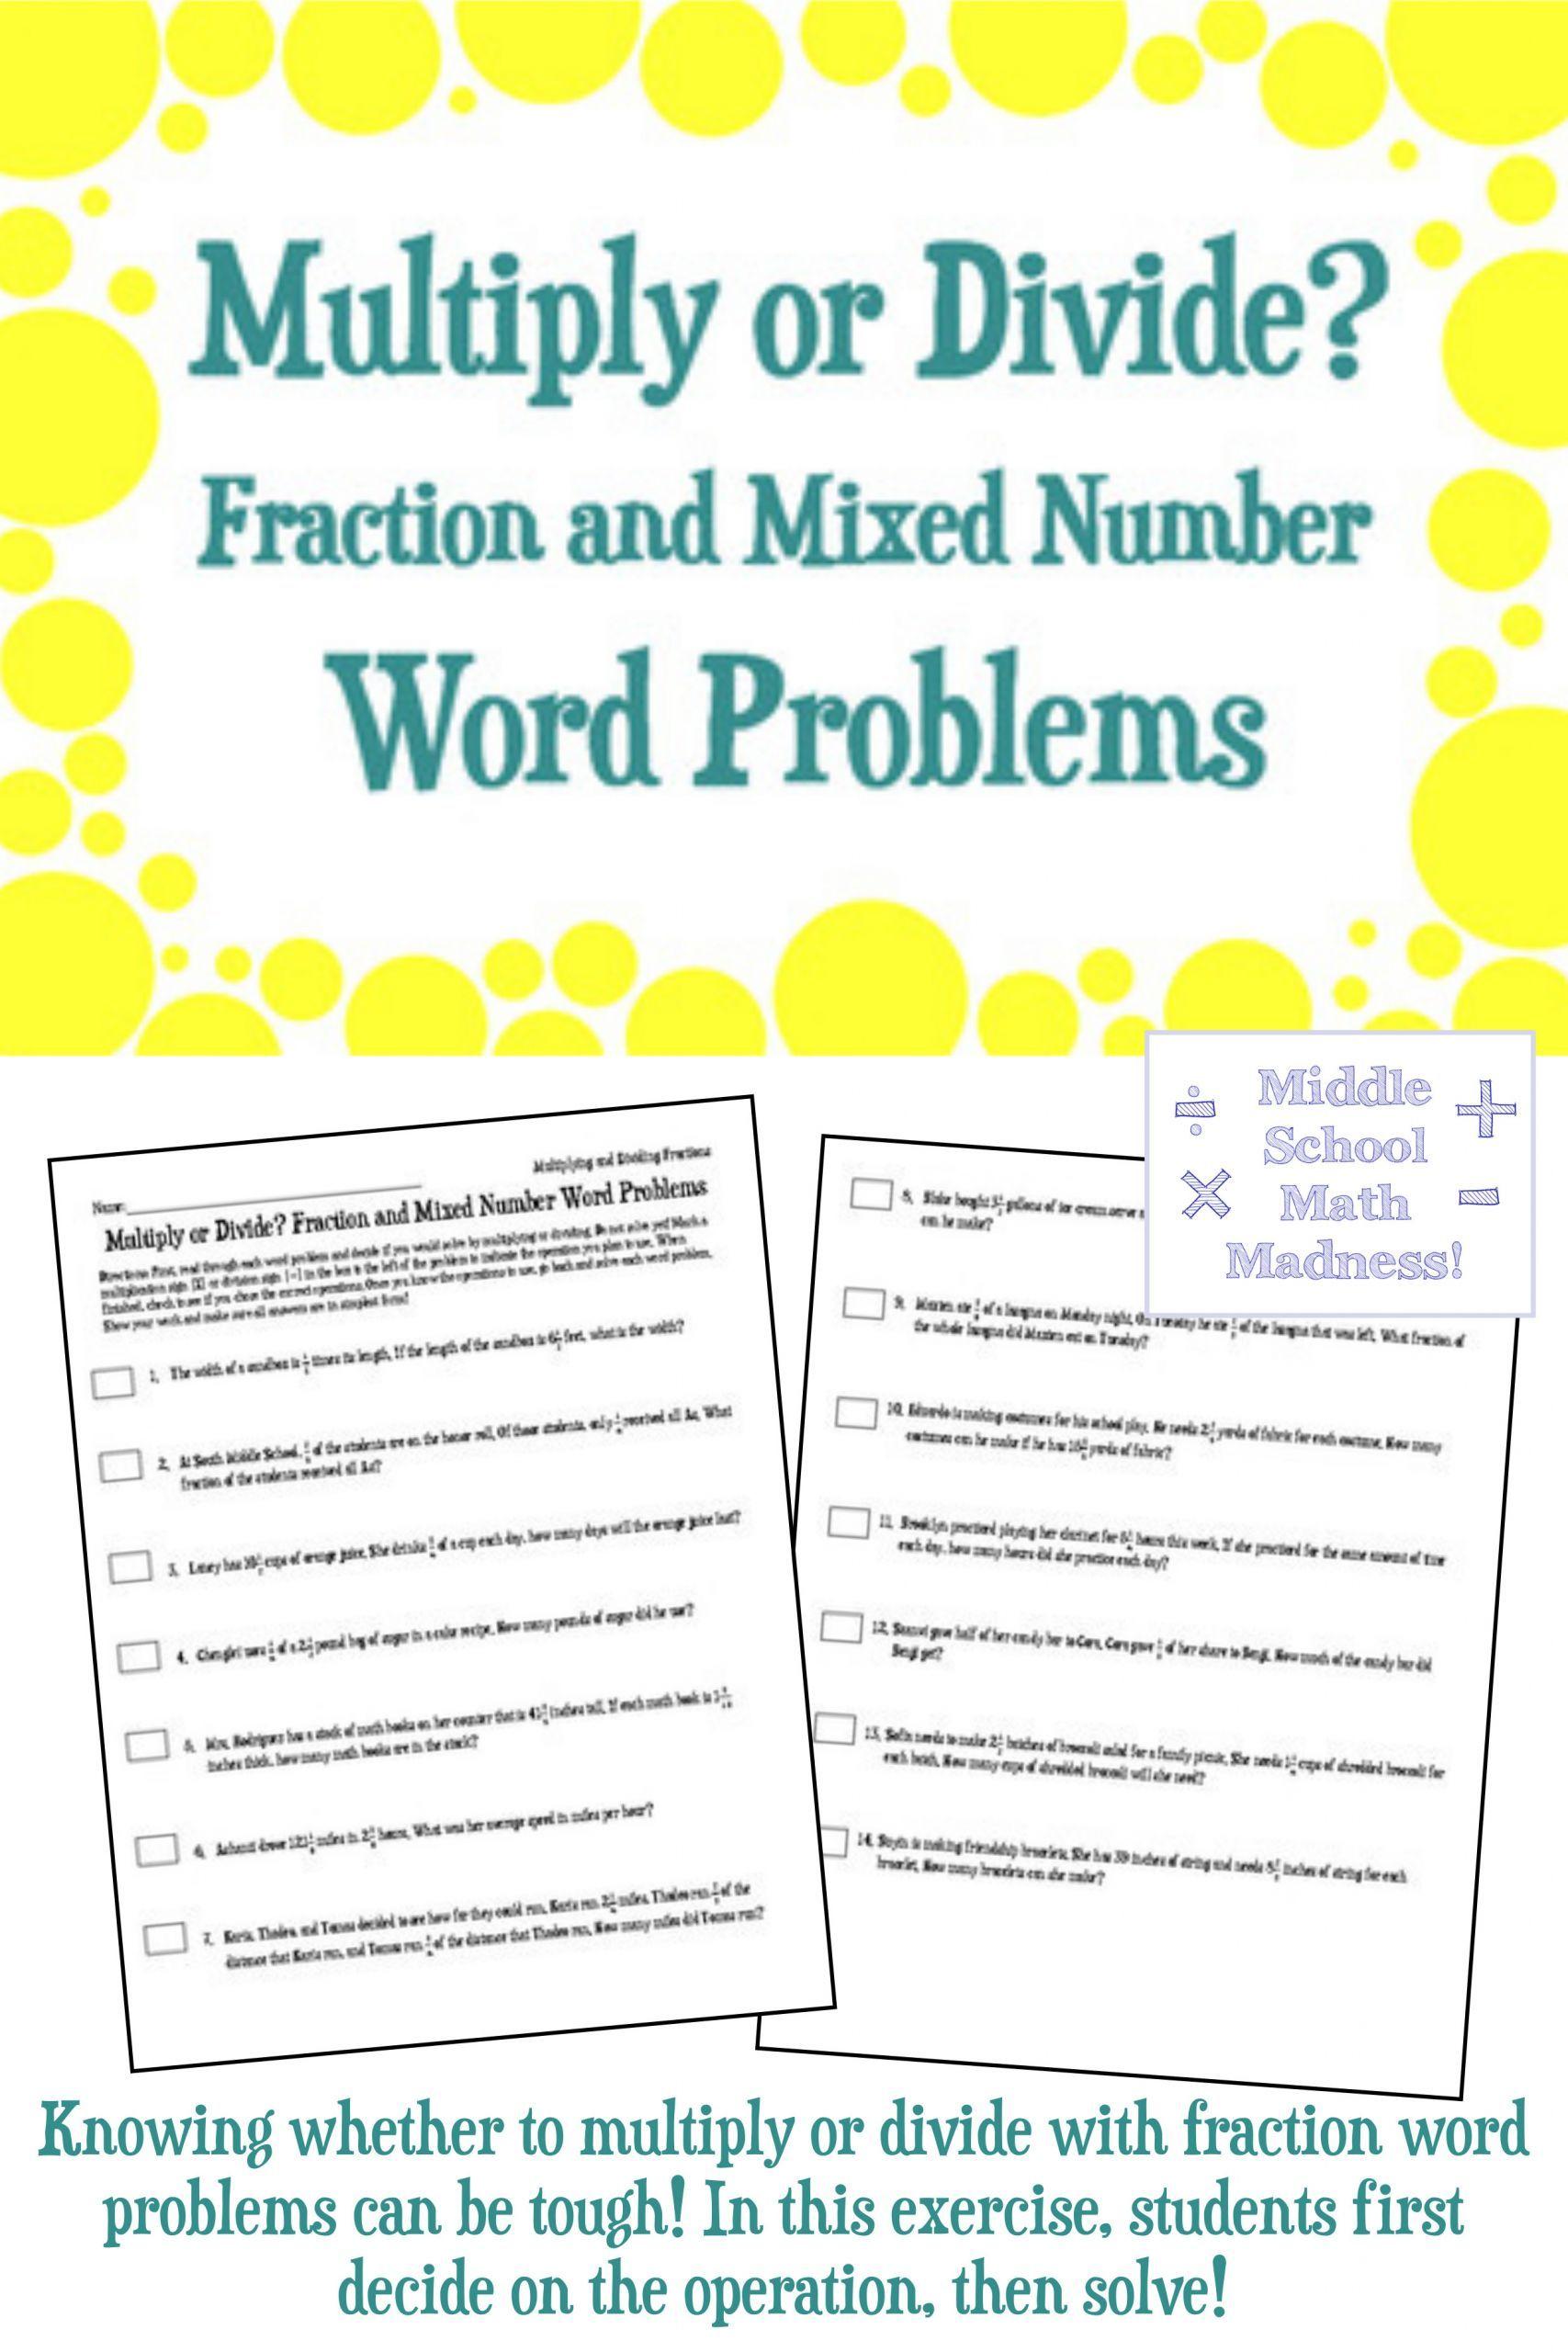 5 Fraction Multiplication Word Problems Multiply Or Divide